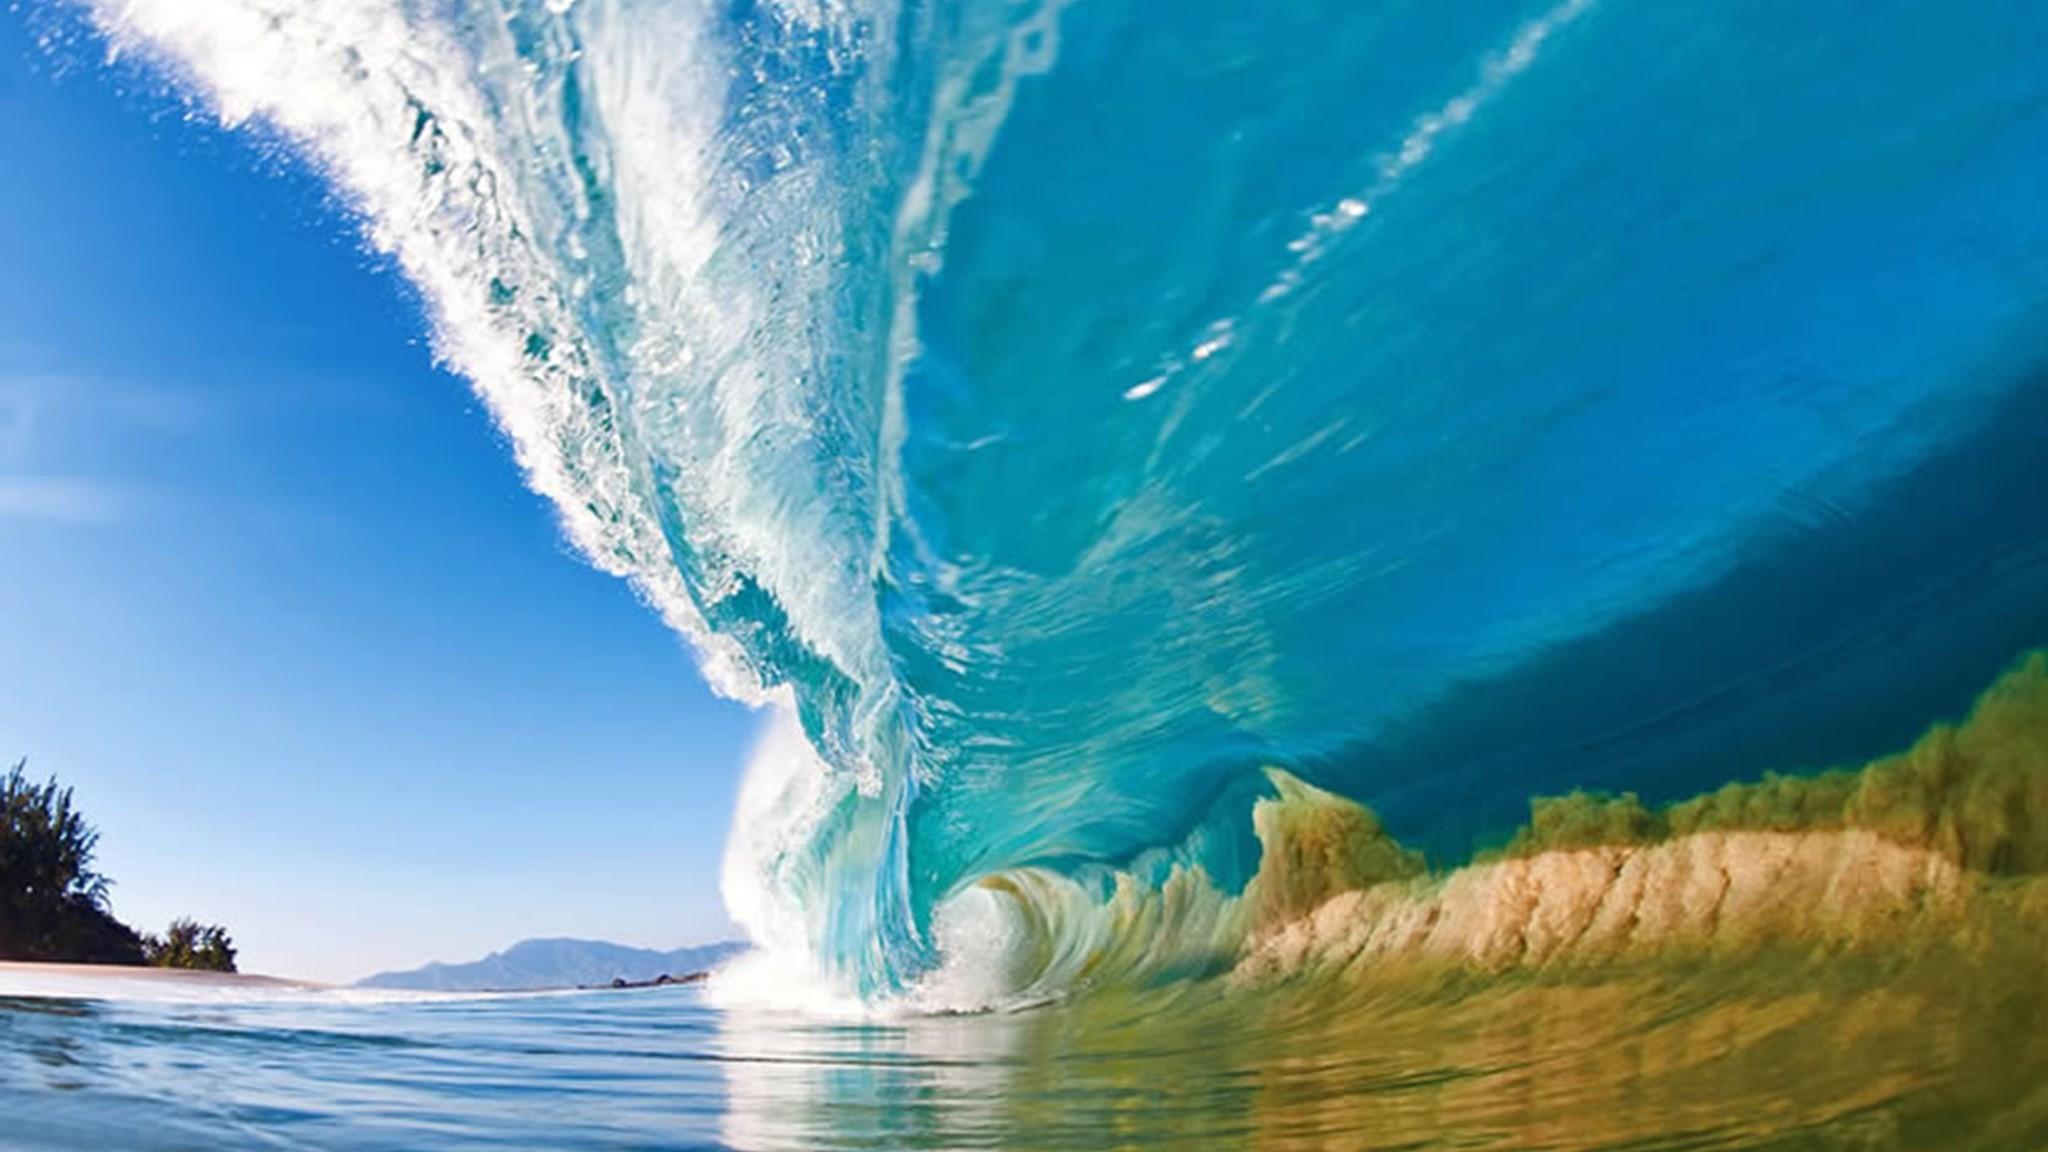 hawaii wallpaper for desktop background